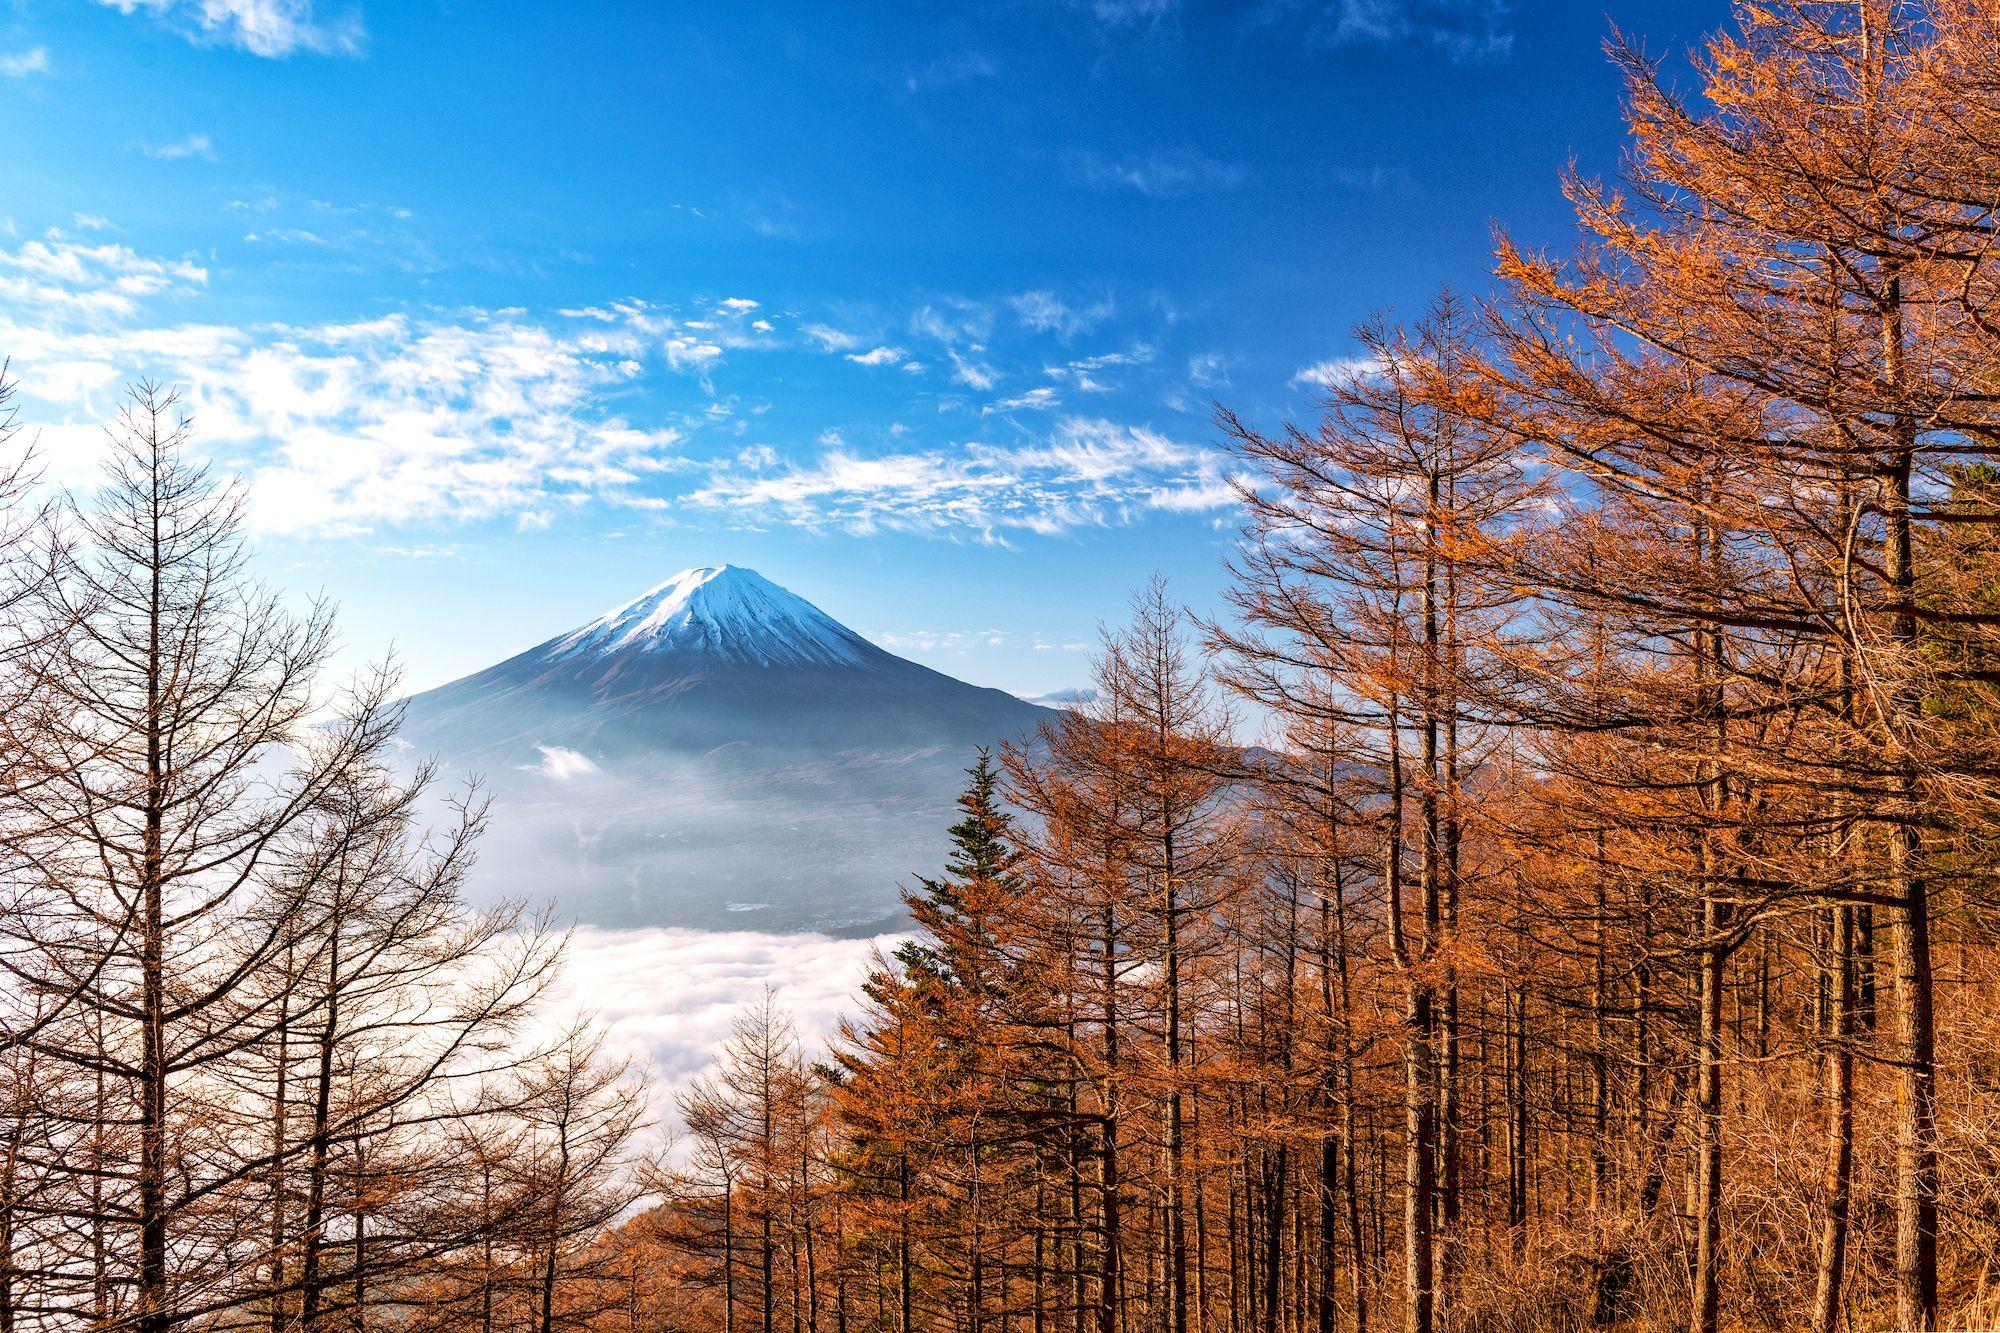 Today is the day of #MtFuji #富士山の日 . This photo taken by Naoya Yoshida . . . . . #PASHADELIC #絶景delic . #日本の絶景 #山梨 #yamanashi #新道峠 #seaofclouds . . #light_nikon #nikond850 #beautifulview #igers #ig_japan #instagood #instajapan #japan #japan_daytime_view #japantravel #japantrip #landscape #nature #natureshots #nature_shooters #naturephotography #photooftheday #photography #photo_jpn #photo_travelers